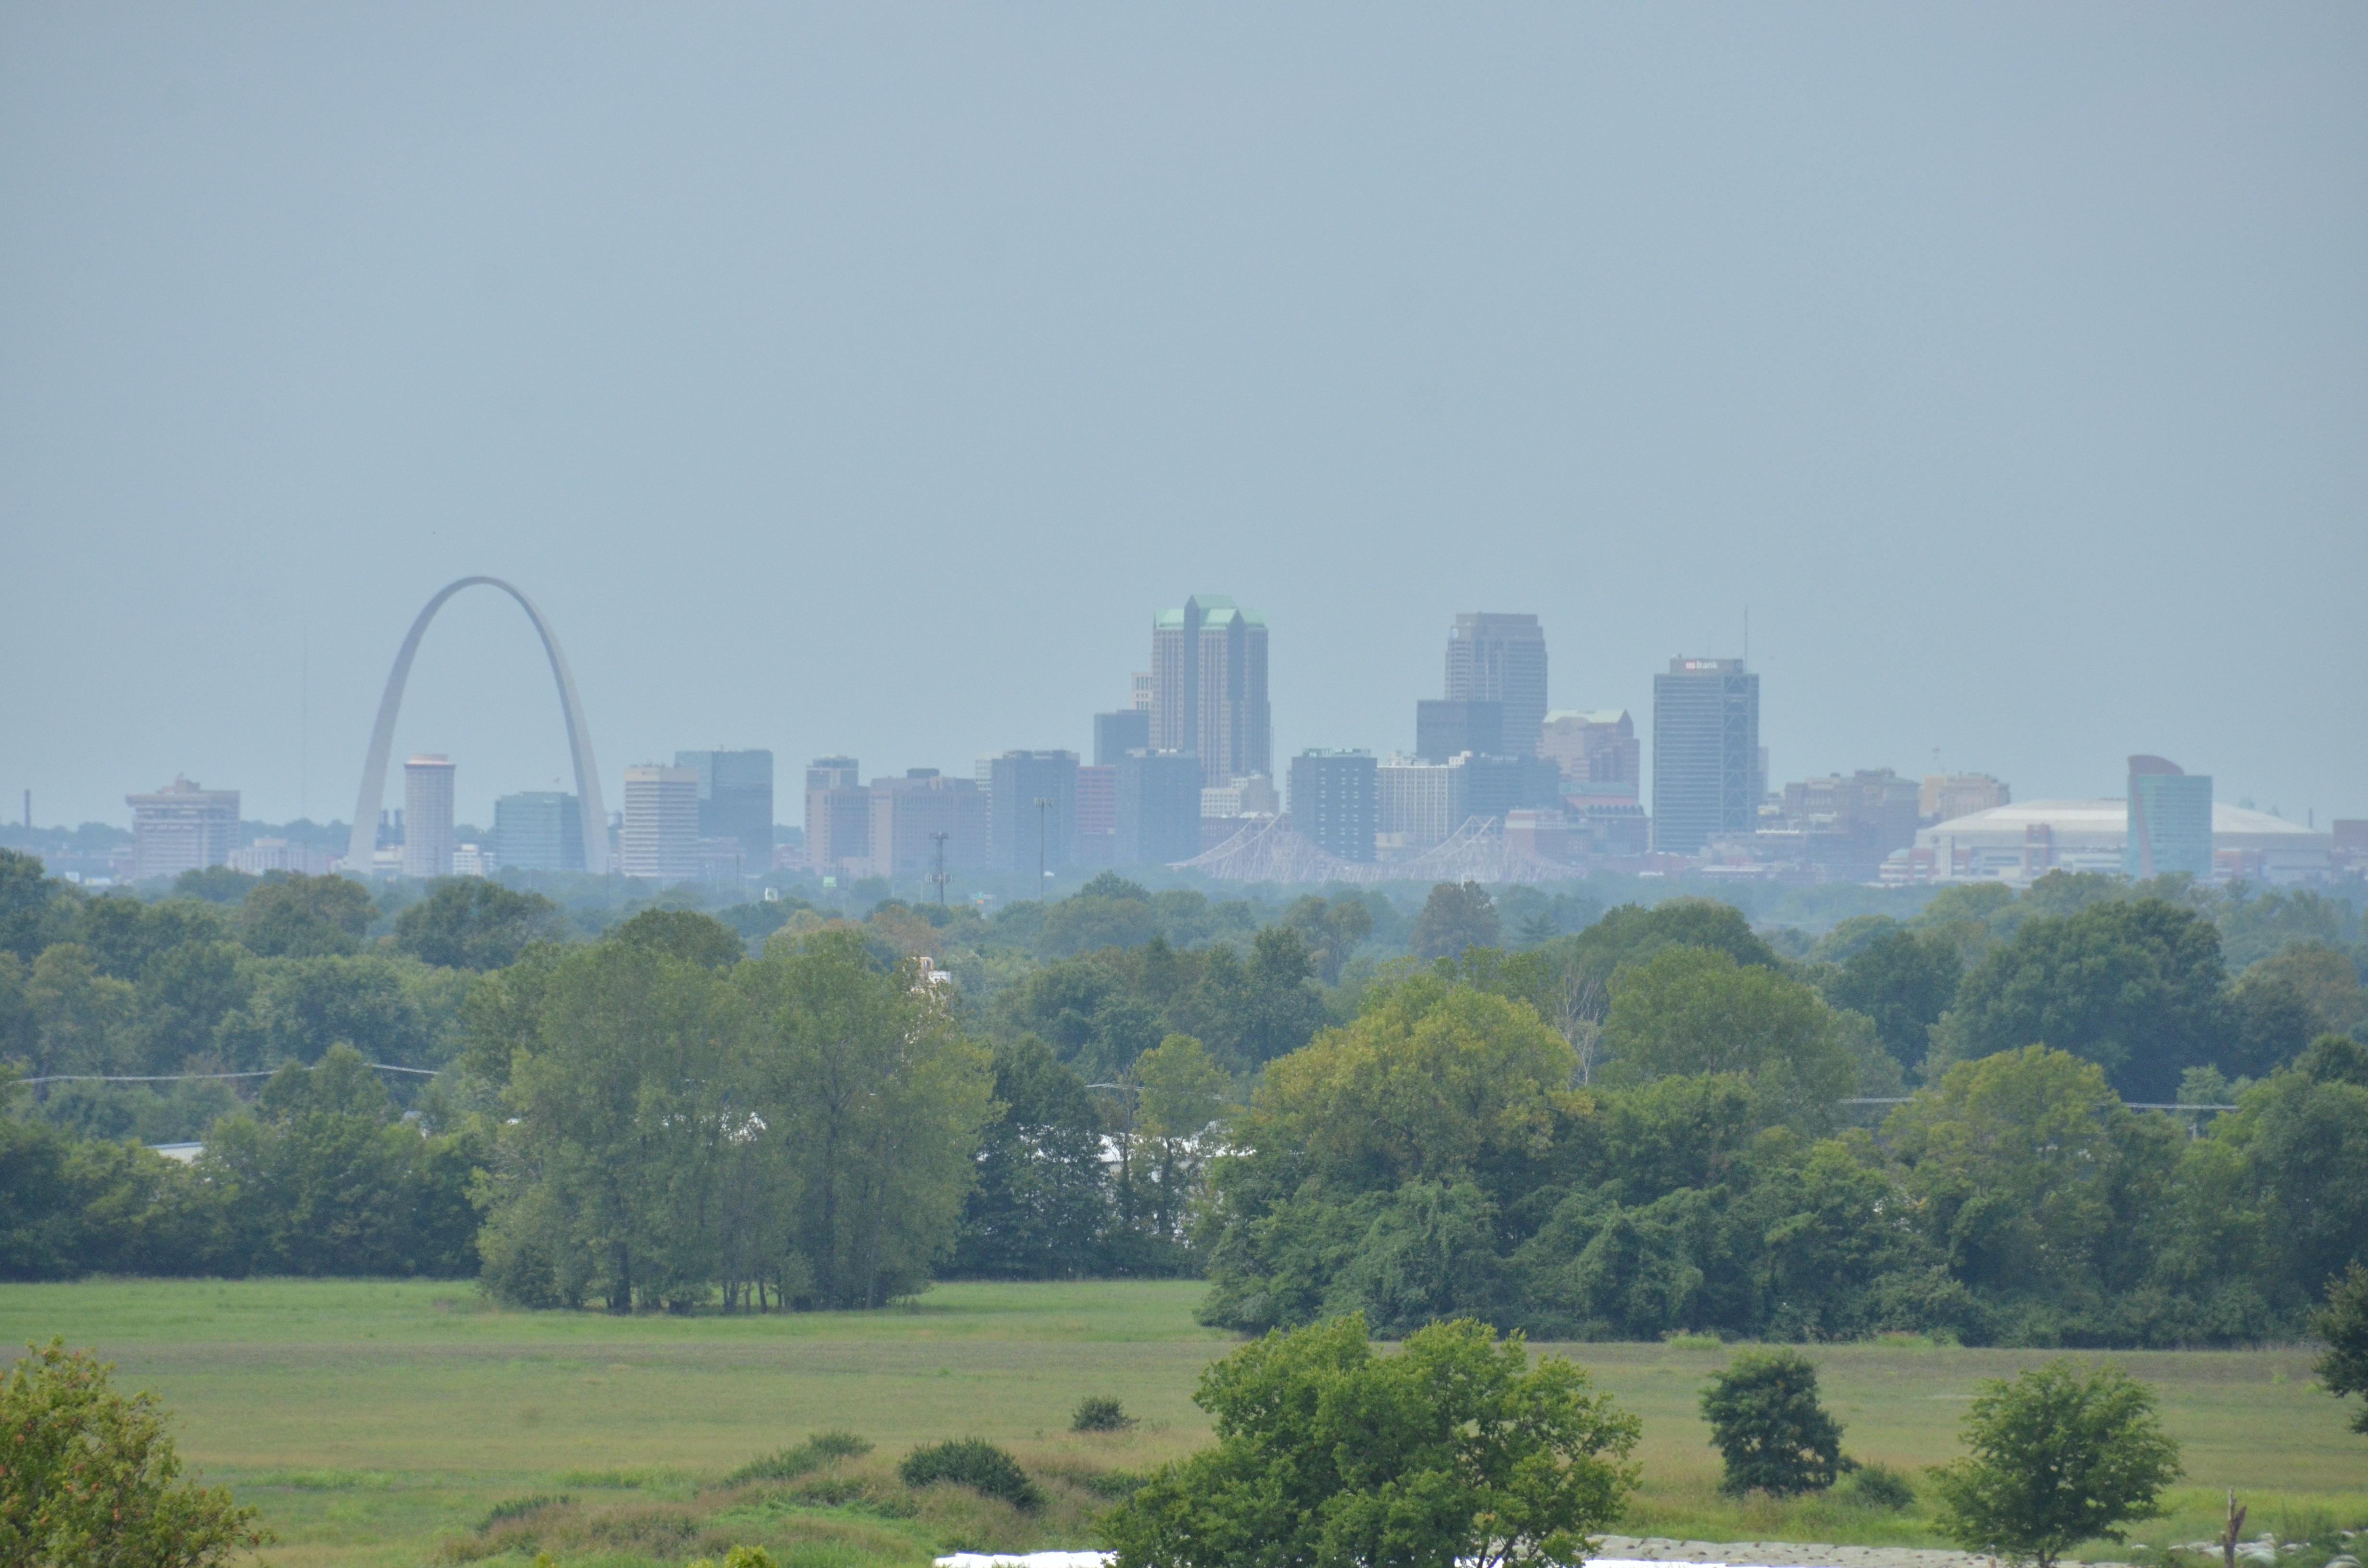 Gateway Arch in St. Louis